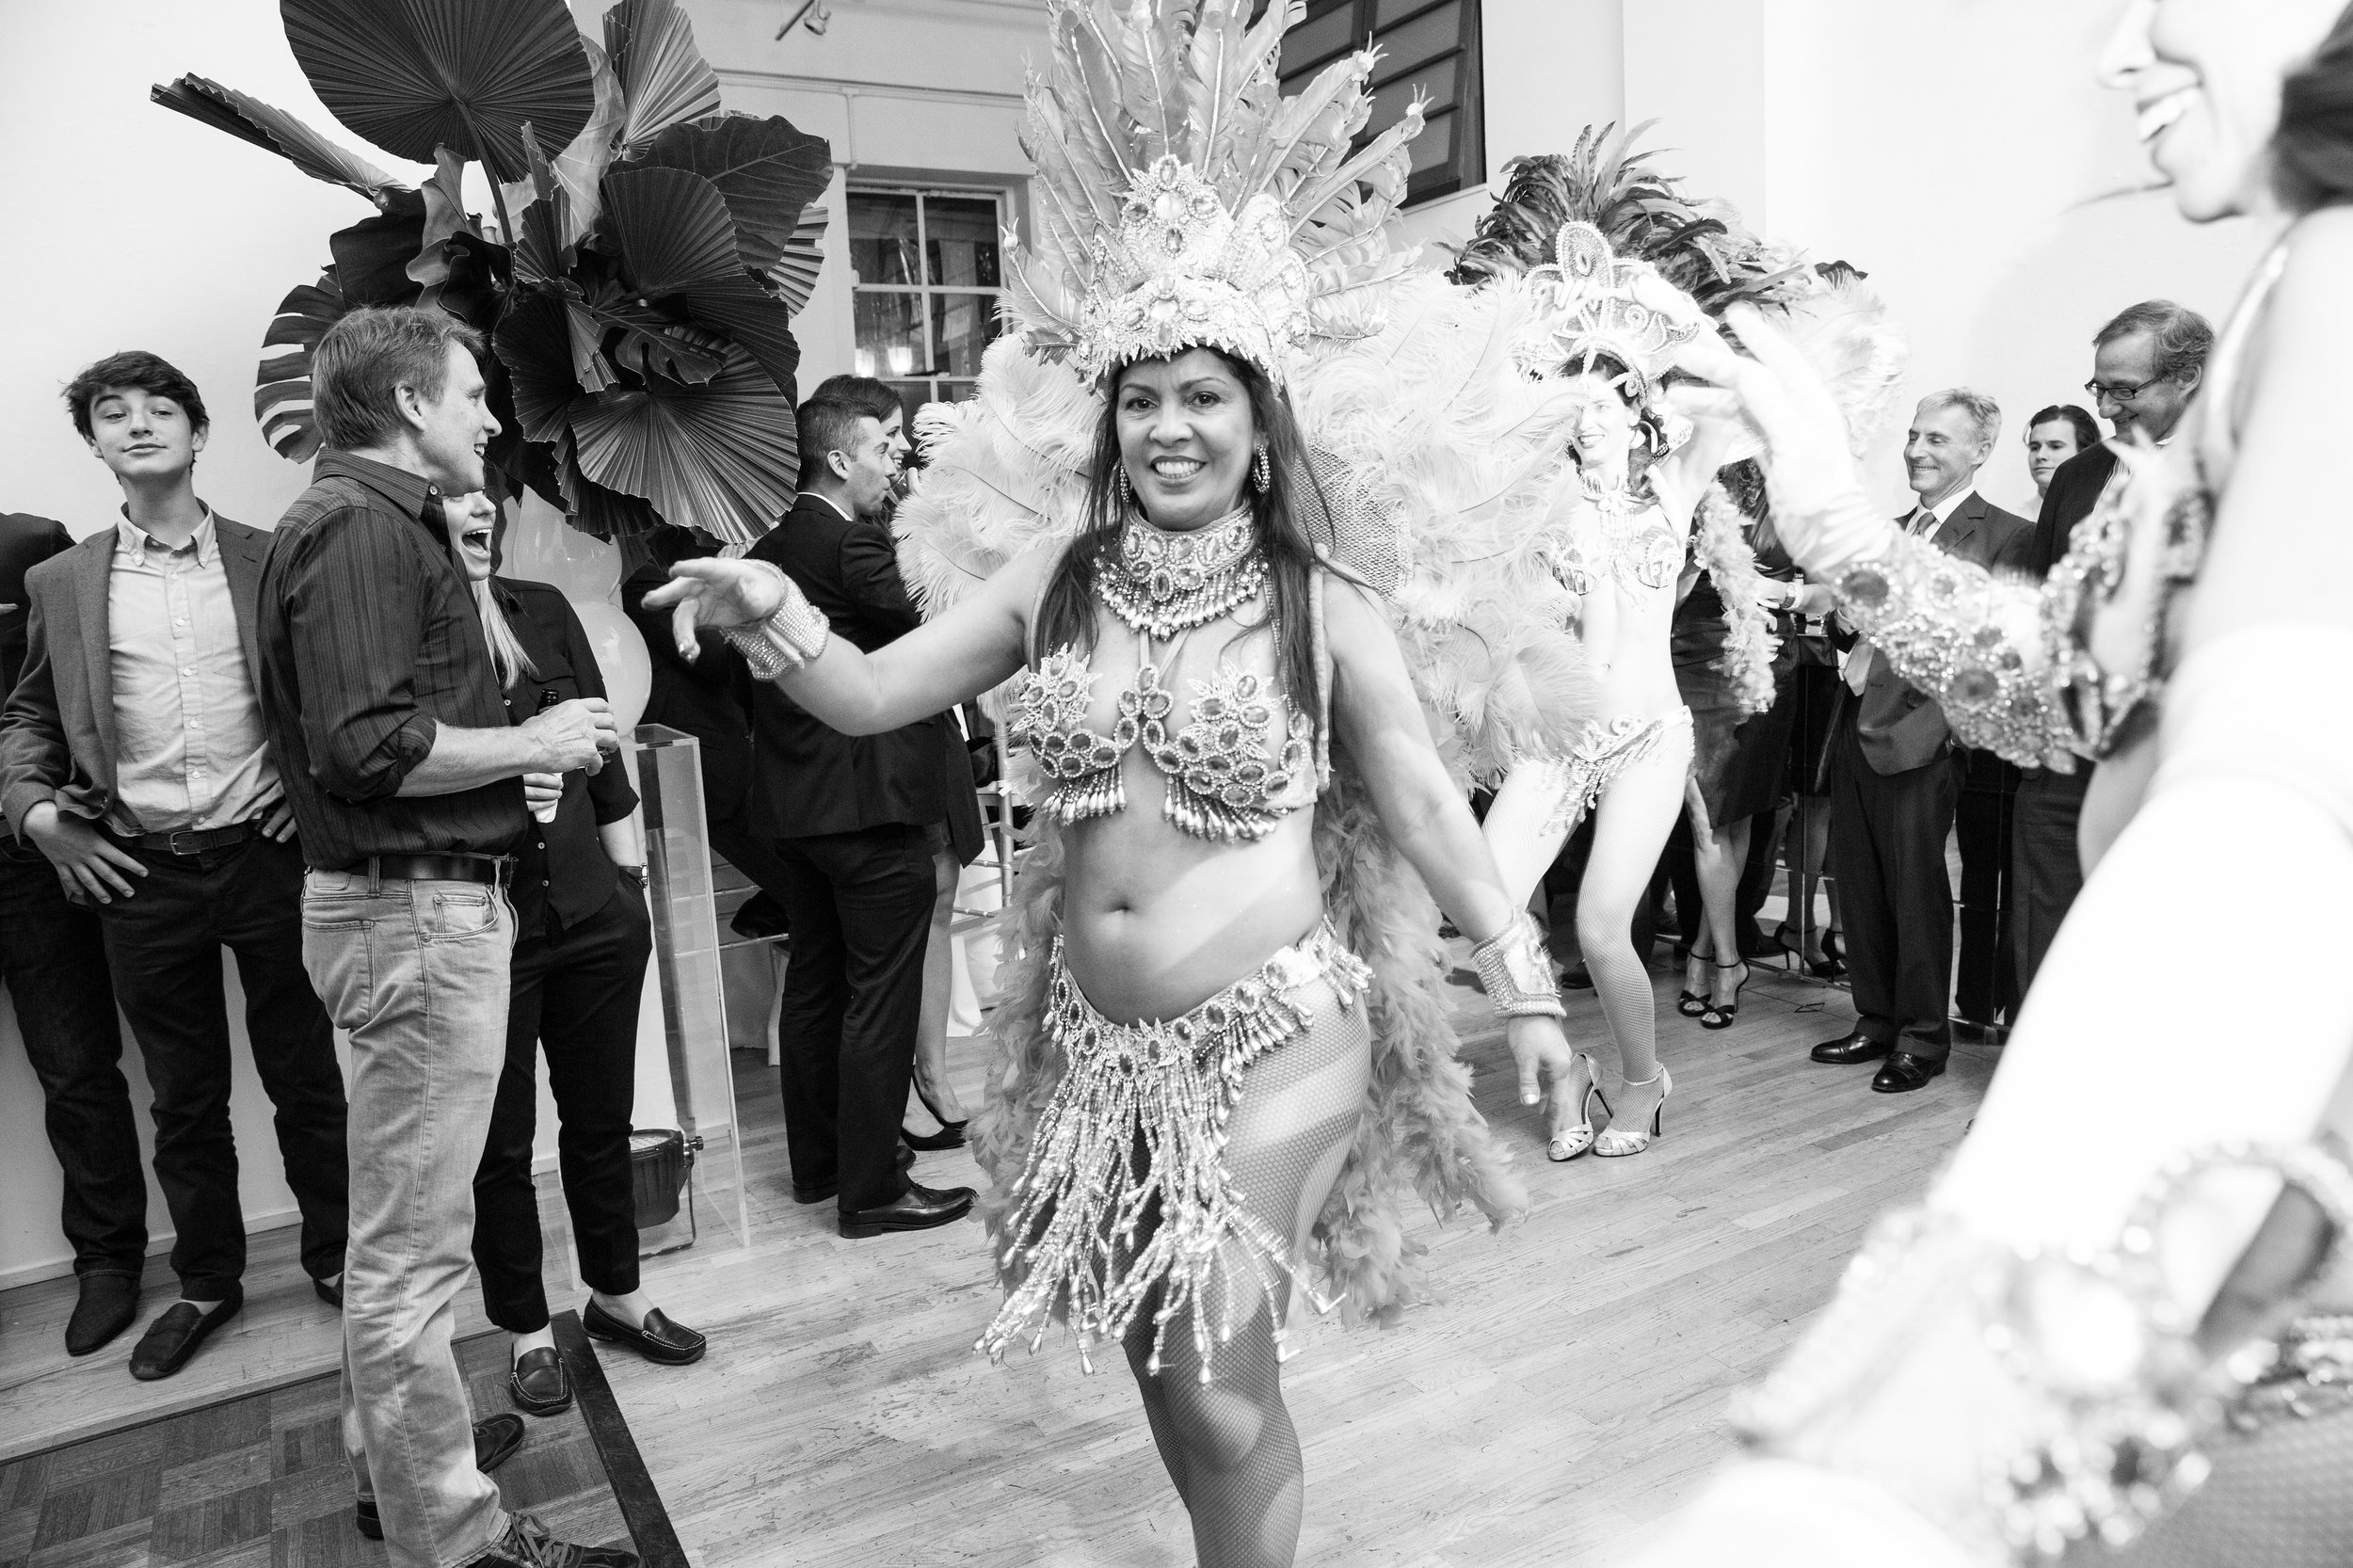 JJ-Ignotz-NYC-Photographer-parties_010.JPG